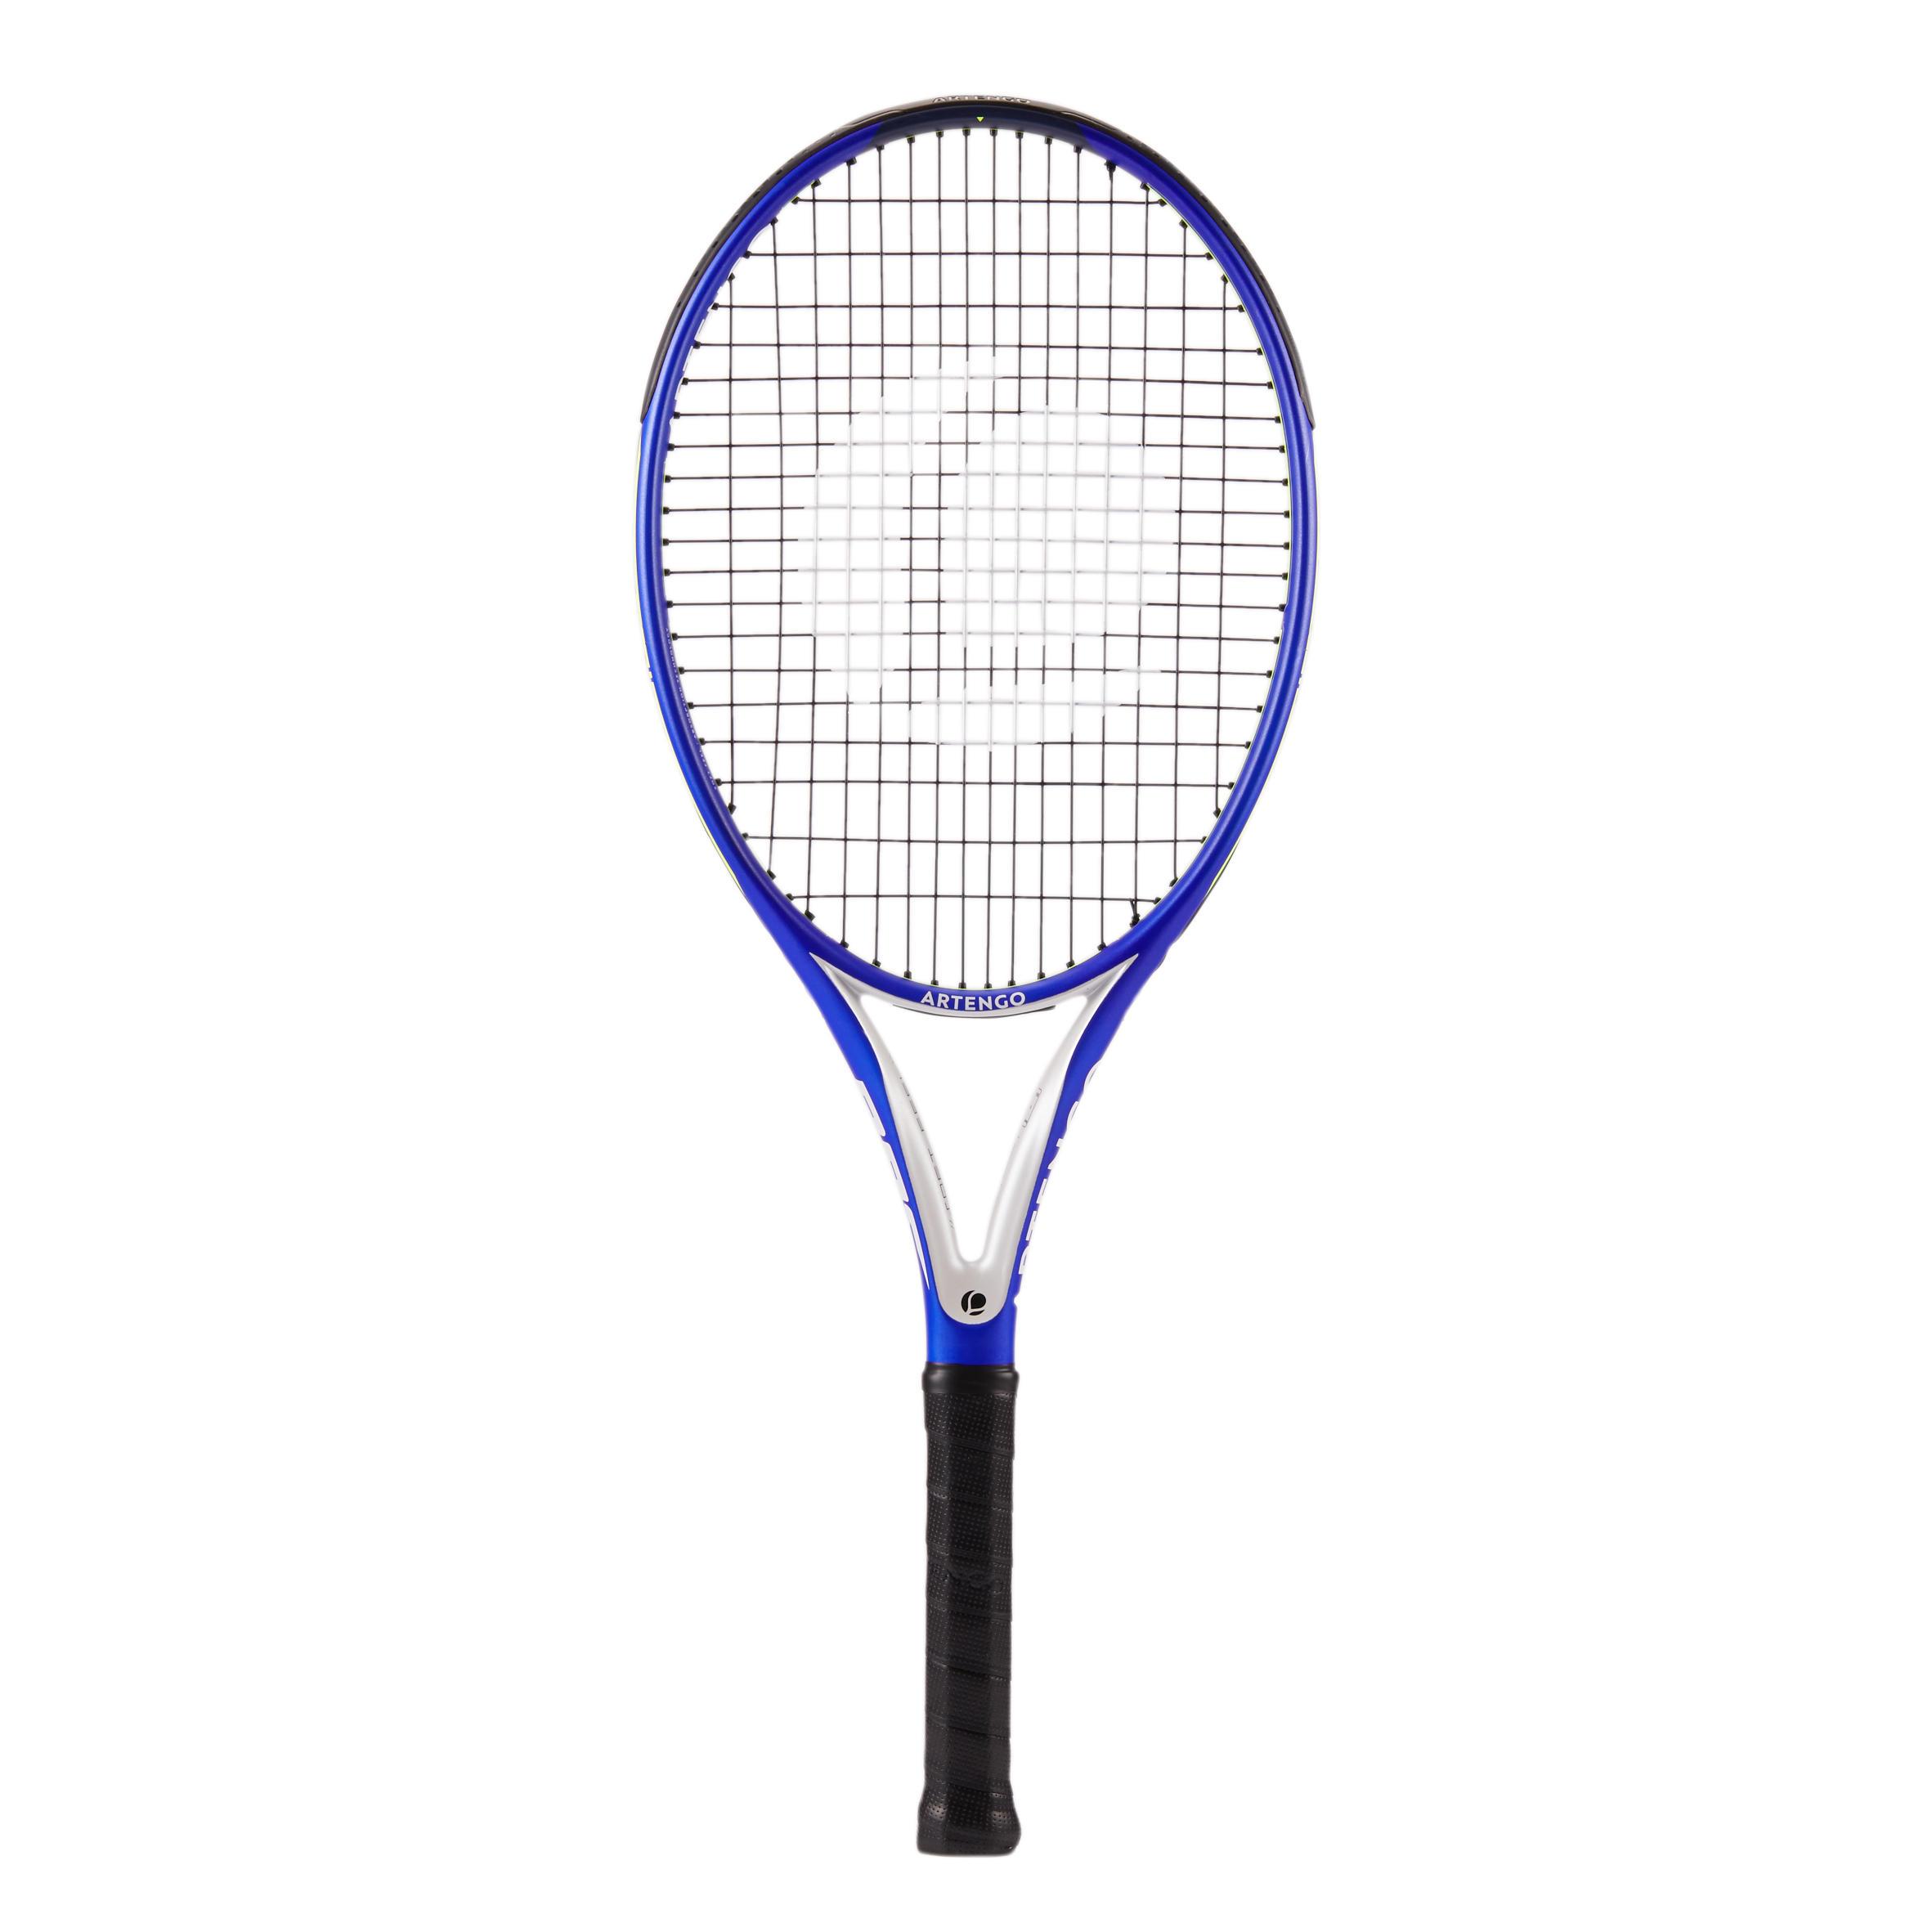 9a12be76135 Tennis Racket